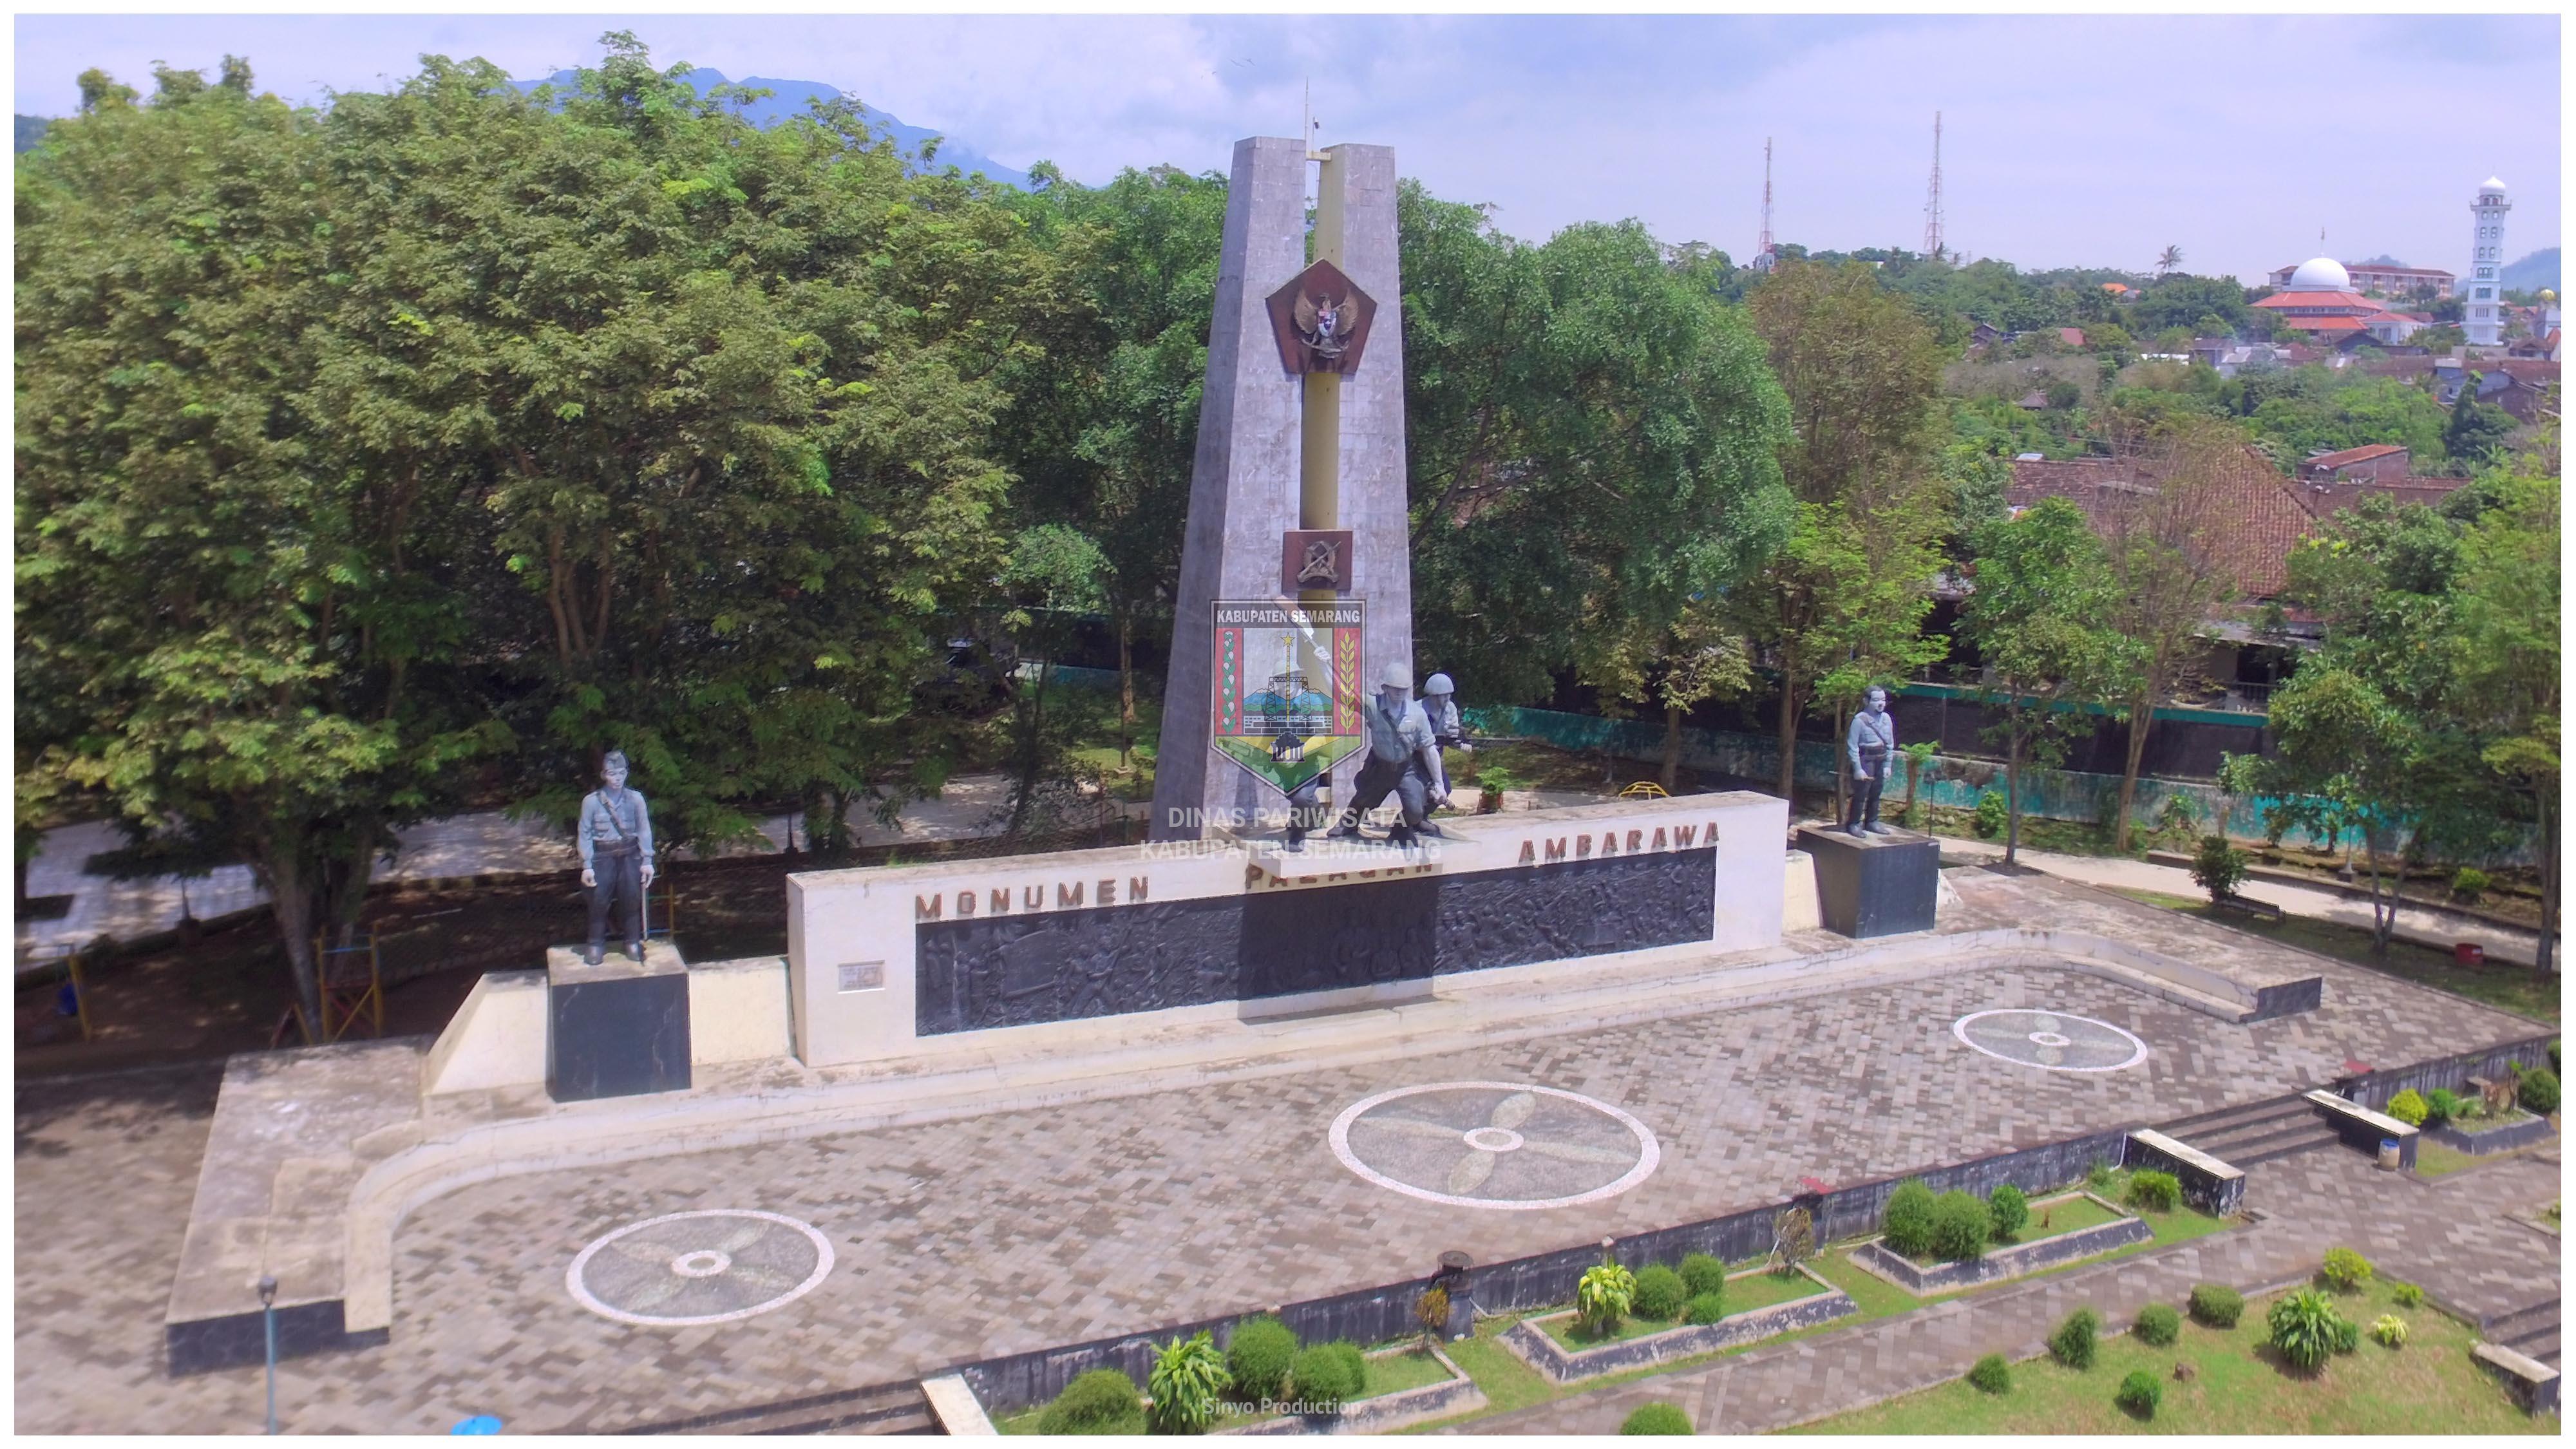 Museum Palagan Ambarawa Kab Semarang Tourism Information Center Monumen